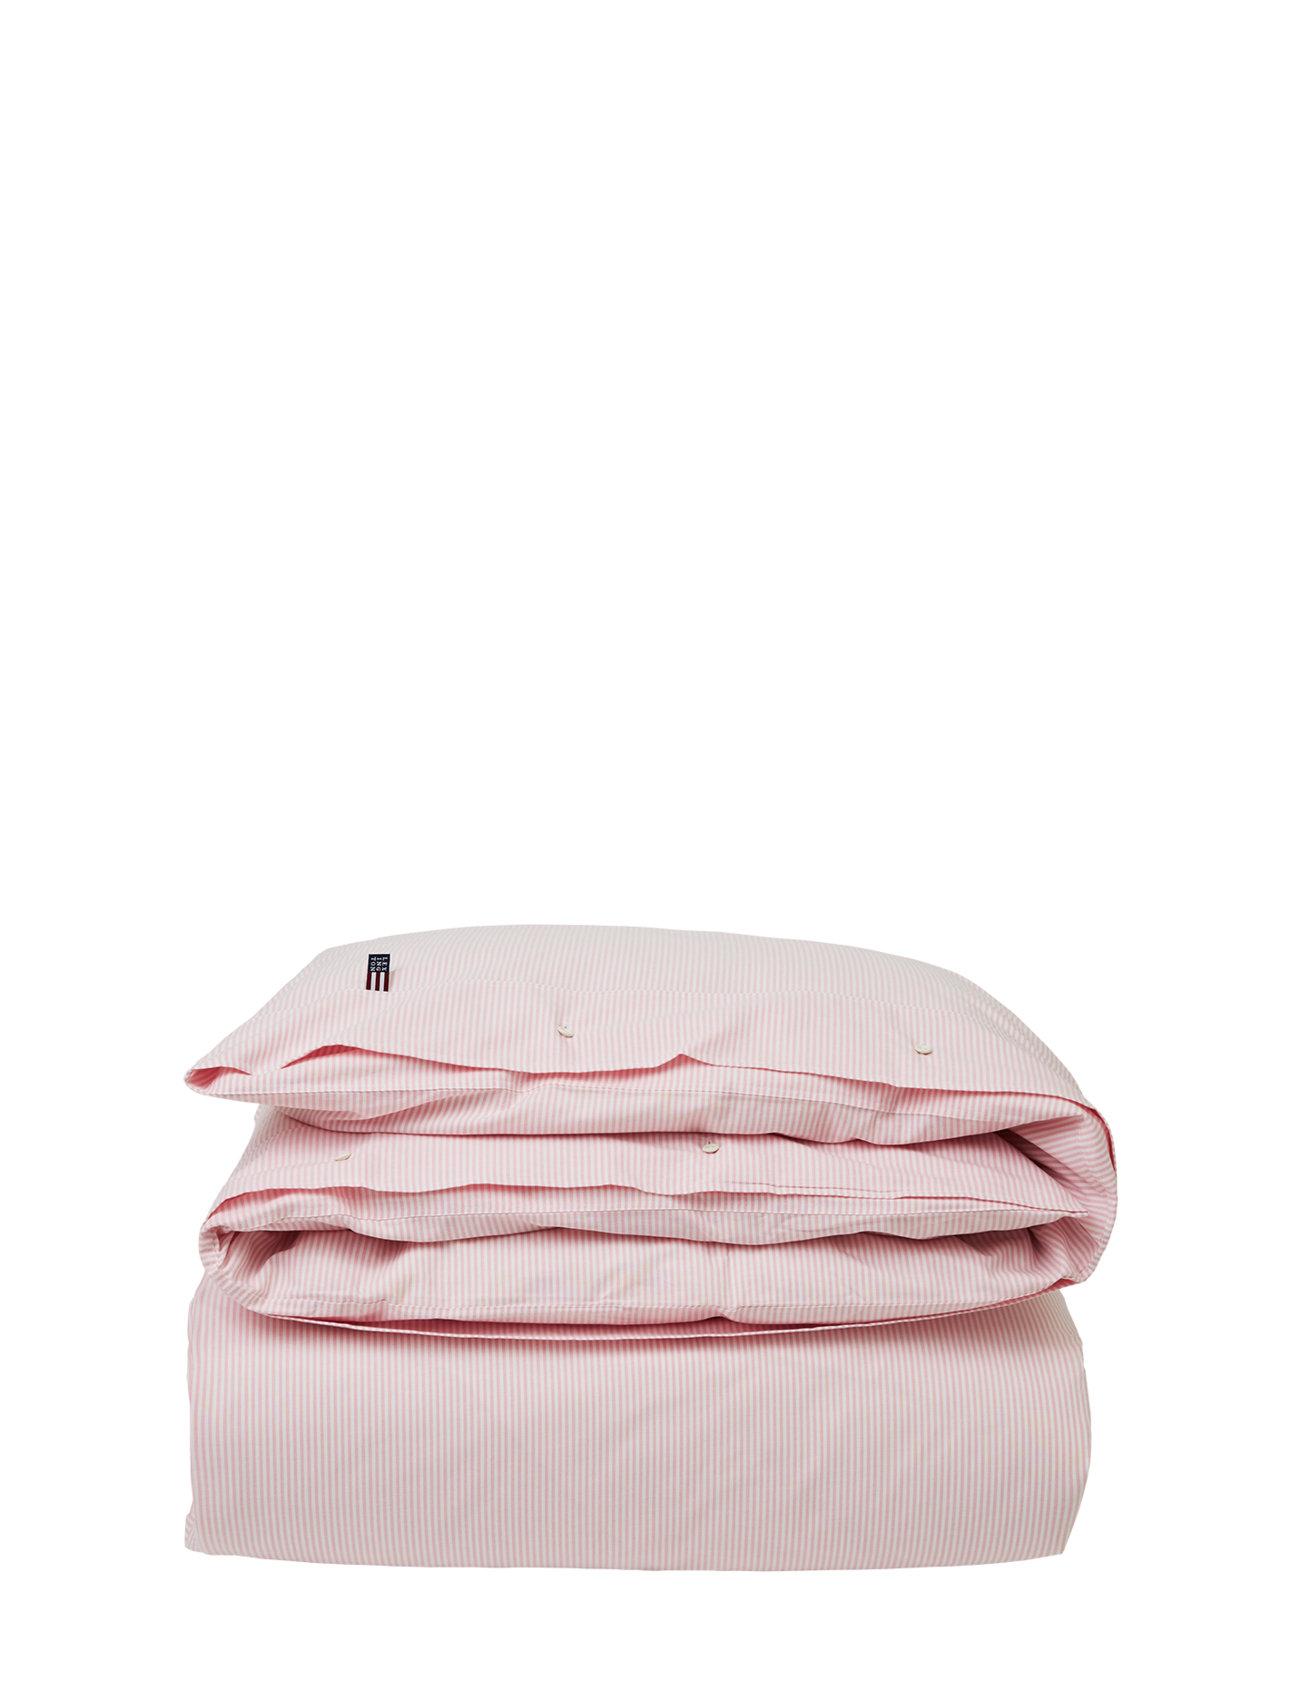 Lexington Home Pin Point Pink/White Duvet - PINK/WHITE